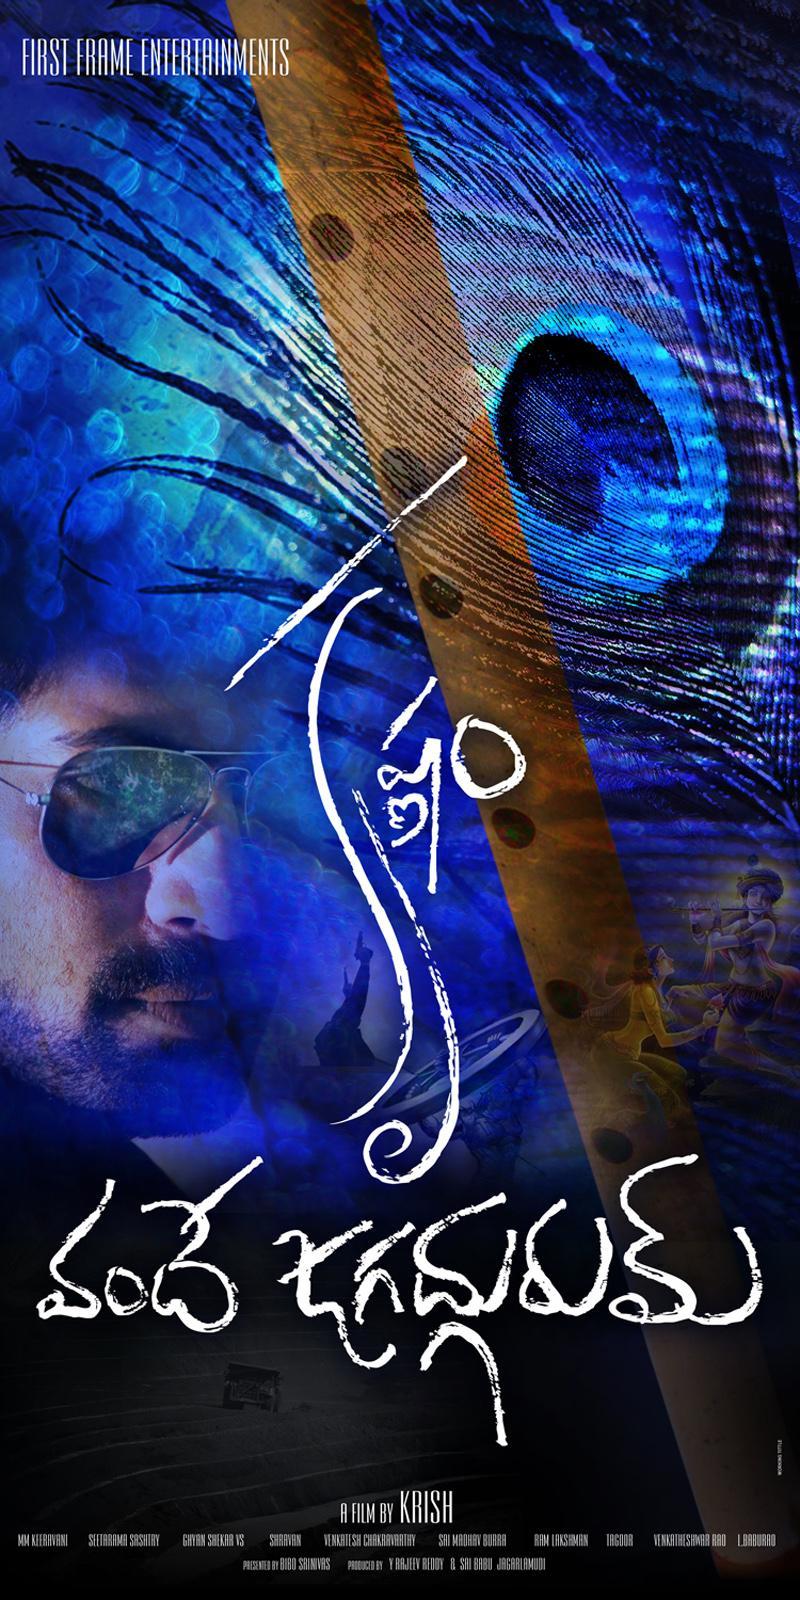 Krishna Vande Jagadgurum 2012 Telugu Movie Promo Mp3 Songs Download | SOUTH INDIA WORLD